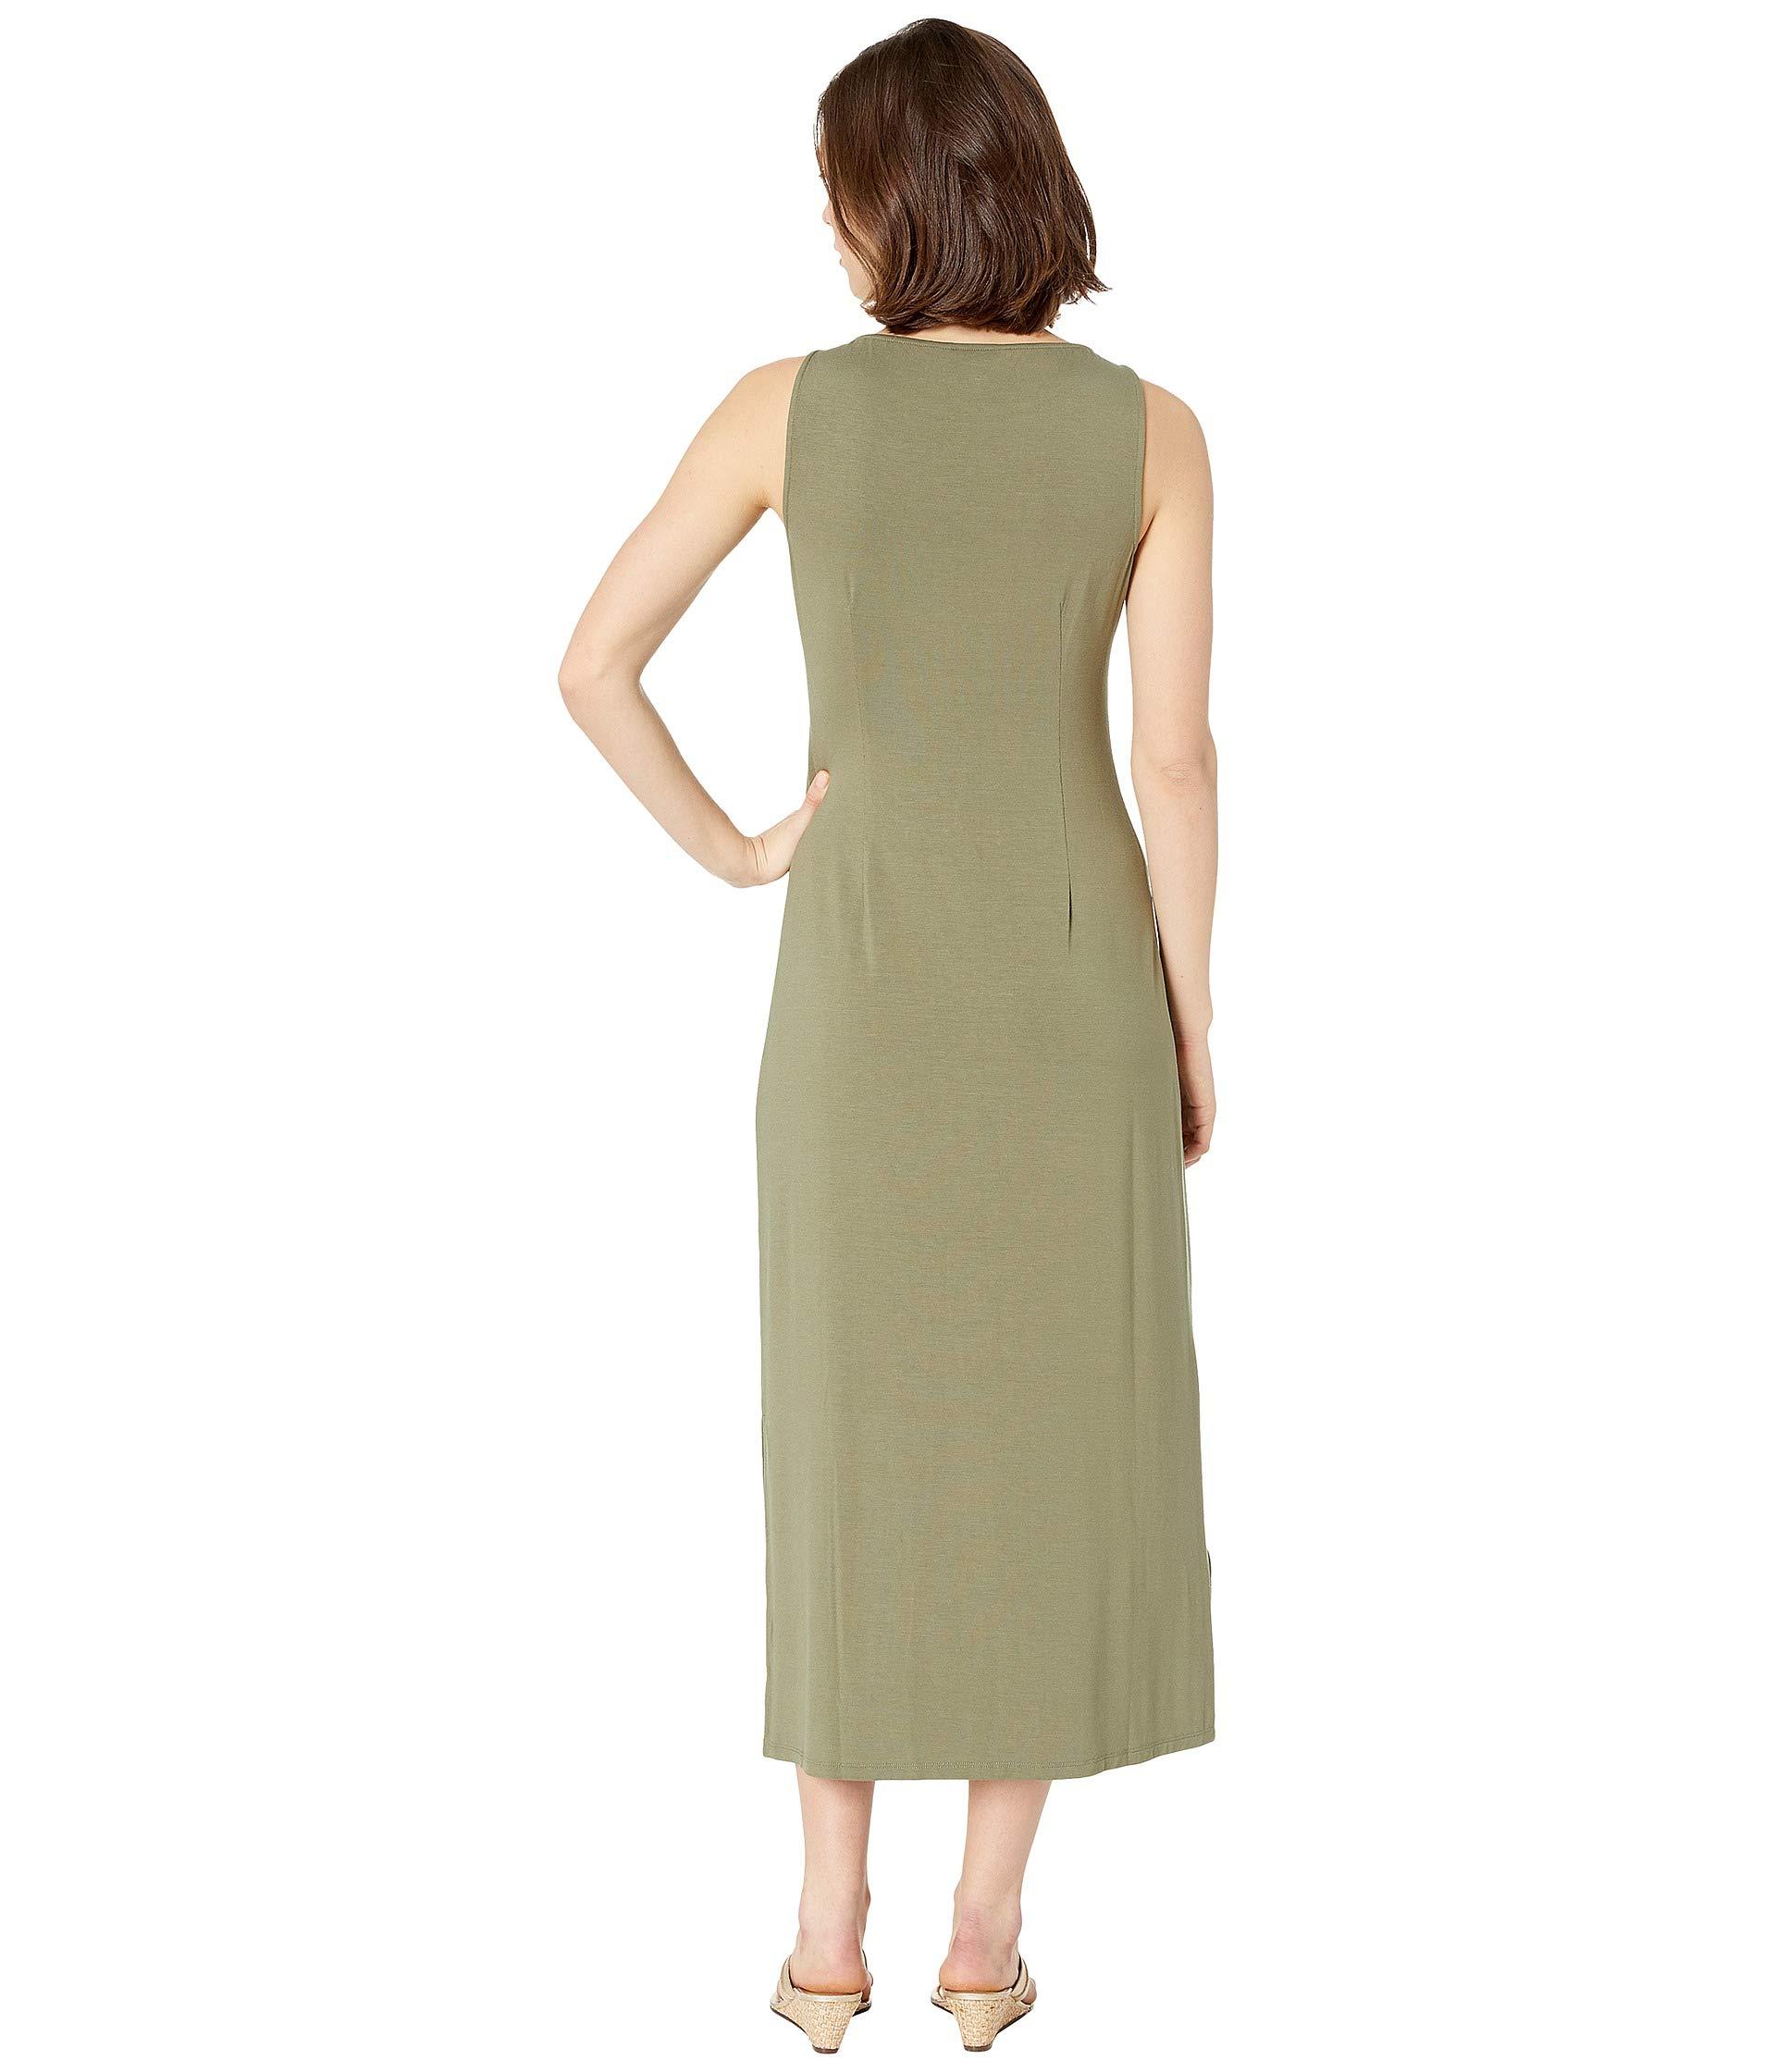 Bahama Sleeveless Tommy Dress Midi Leaf Tea Tambour 0q4w41A6